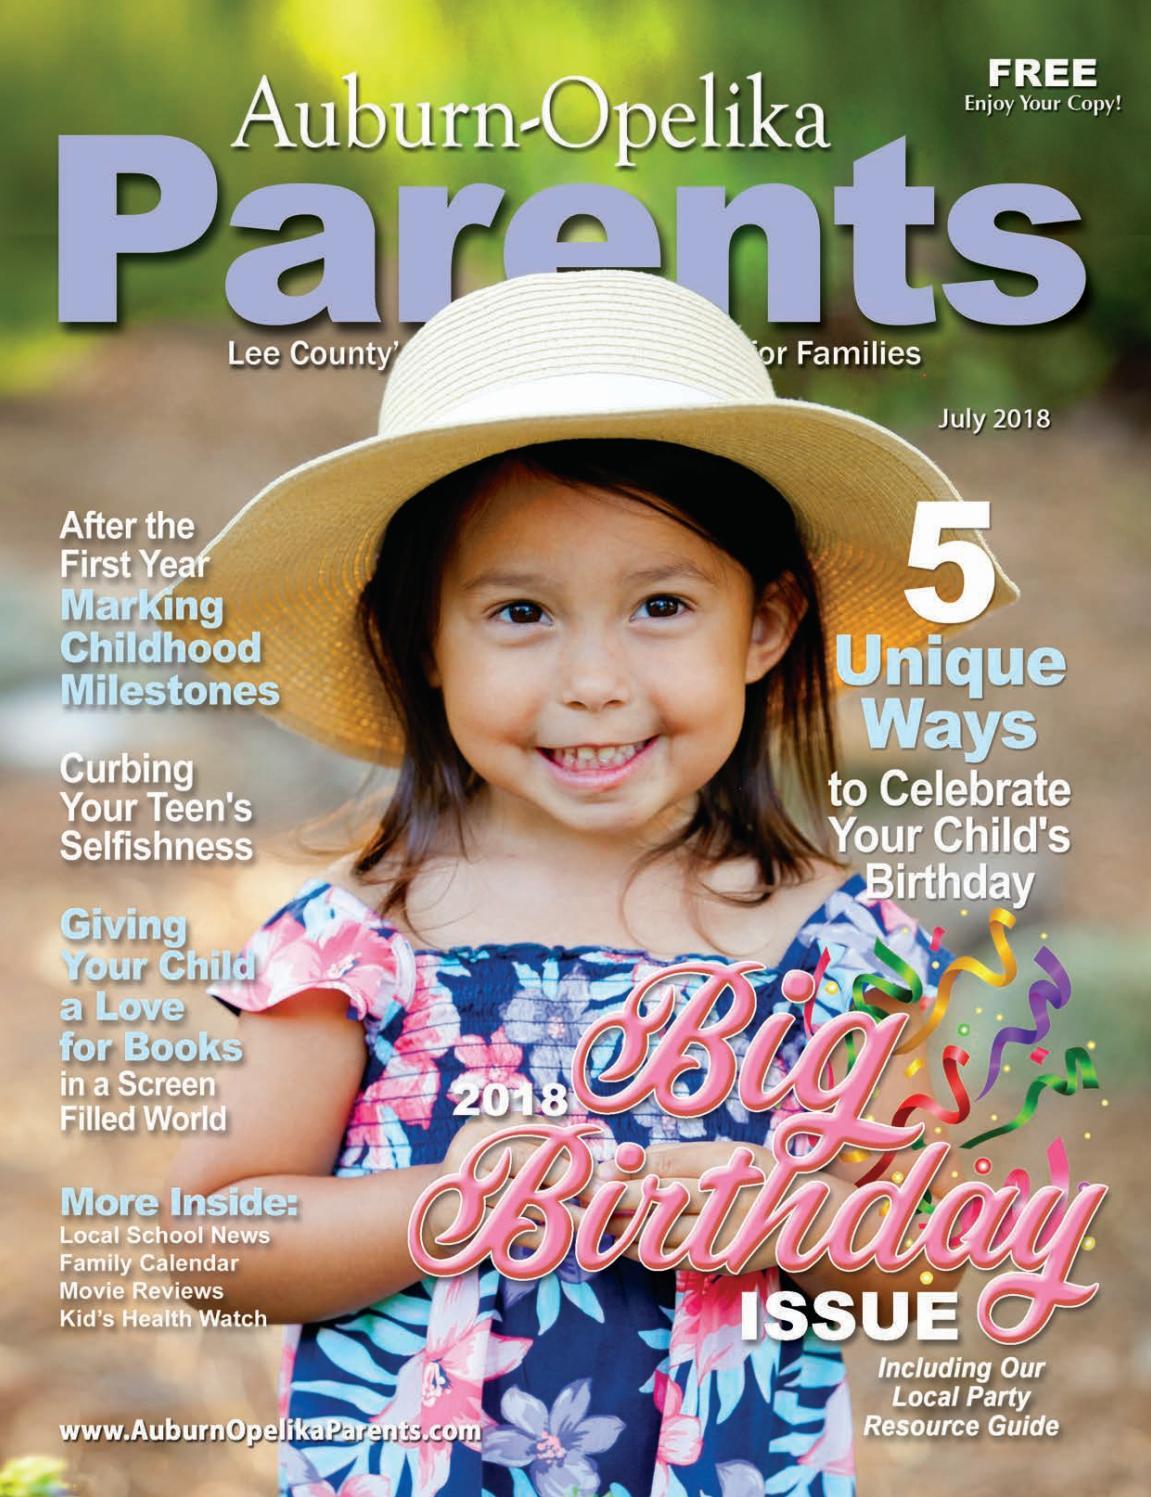 25a84571e Auburn Opelika Parents July 2018 by KeepSharing - issuu